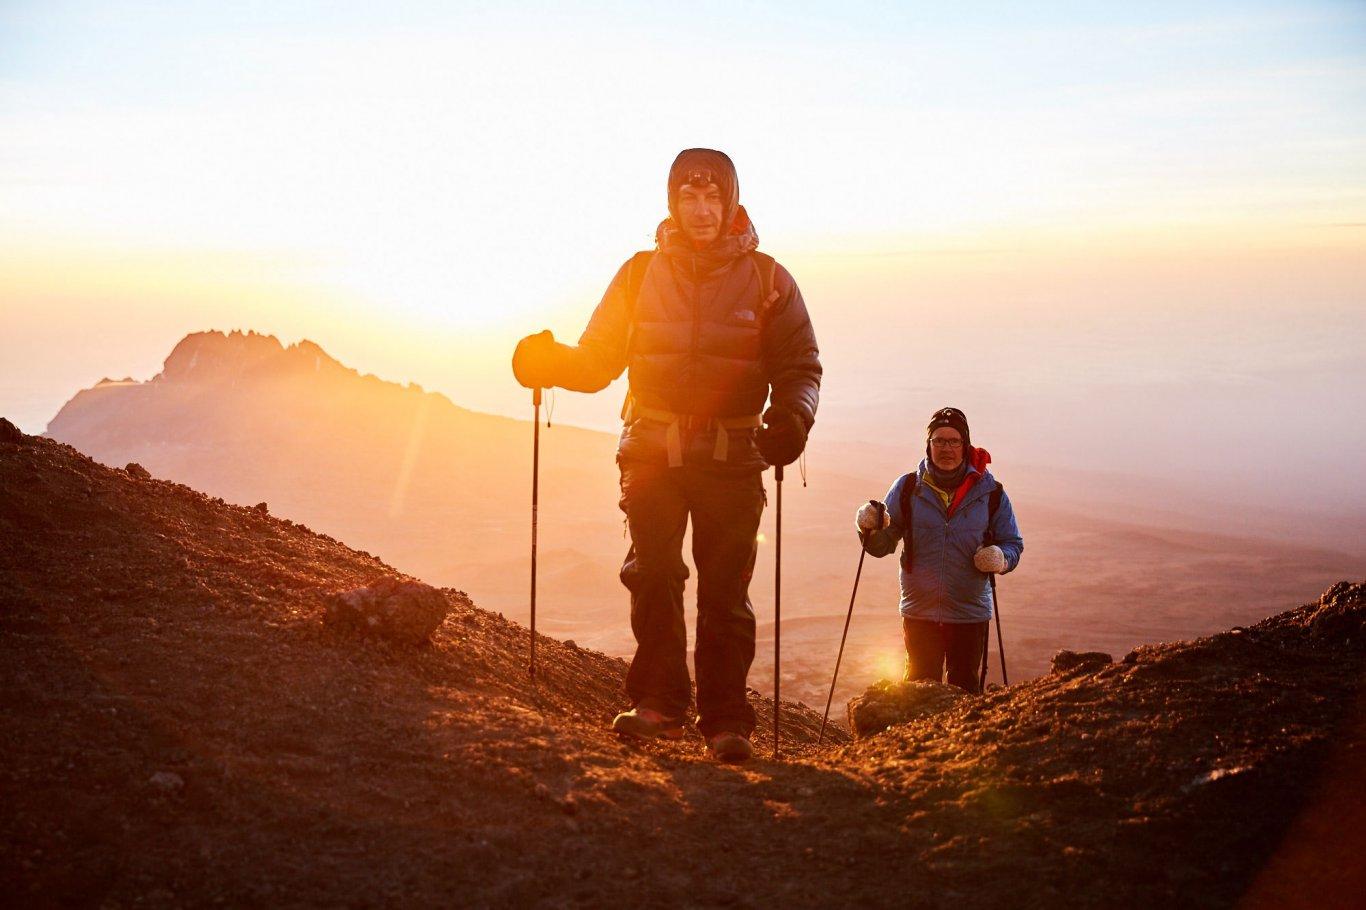 MOUNT KILIMANJARO-MARANGU ROUTE 6 DAYS TREKKING